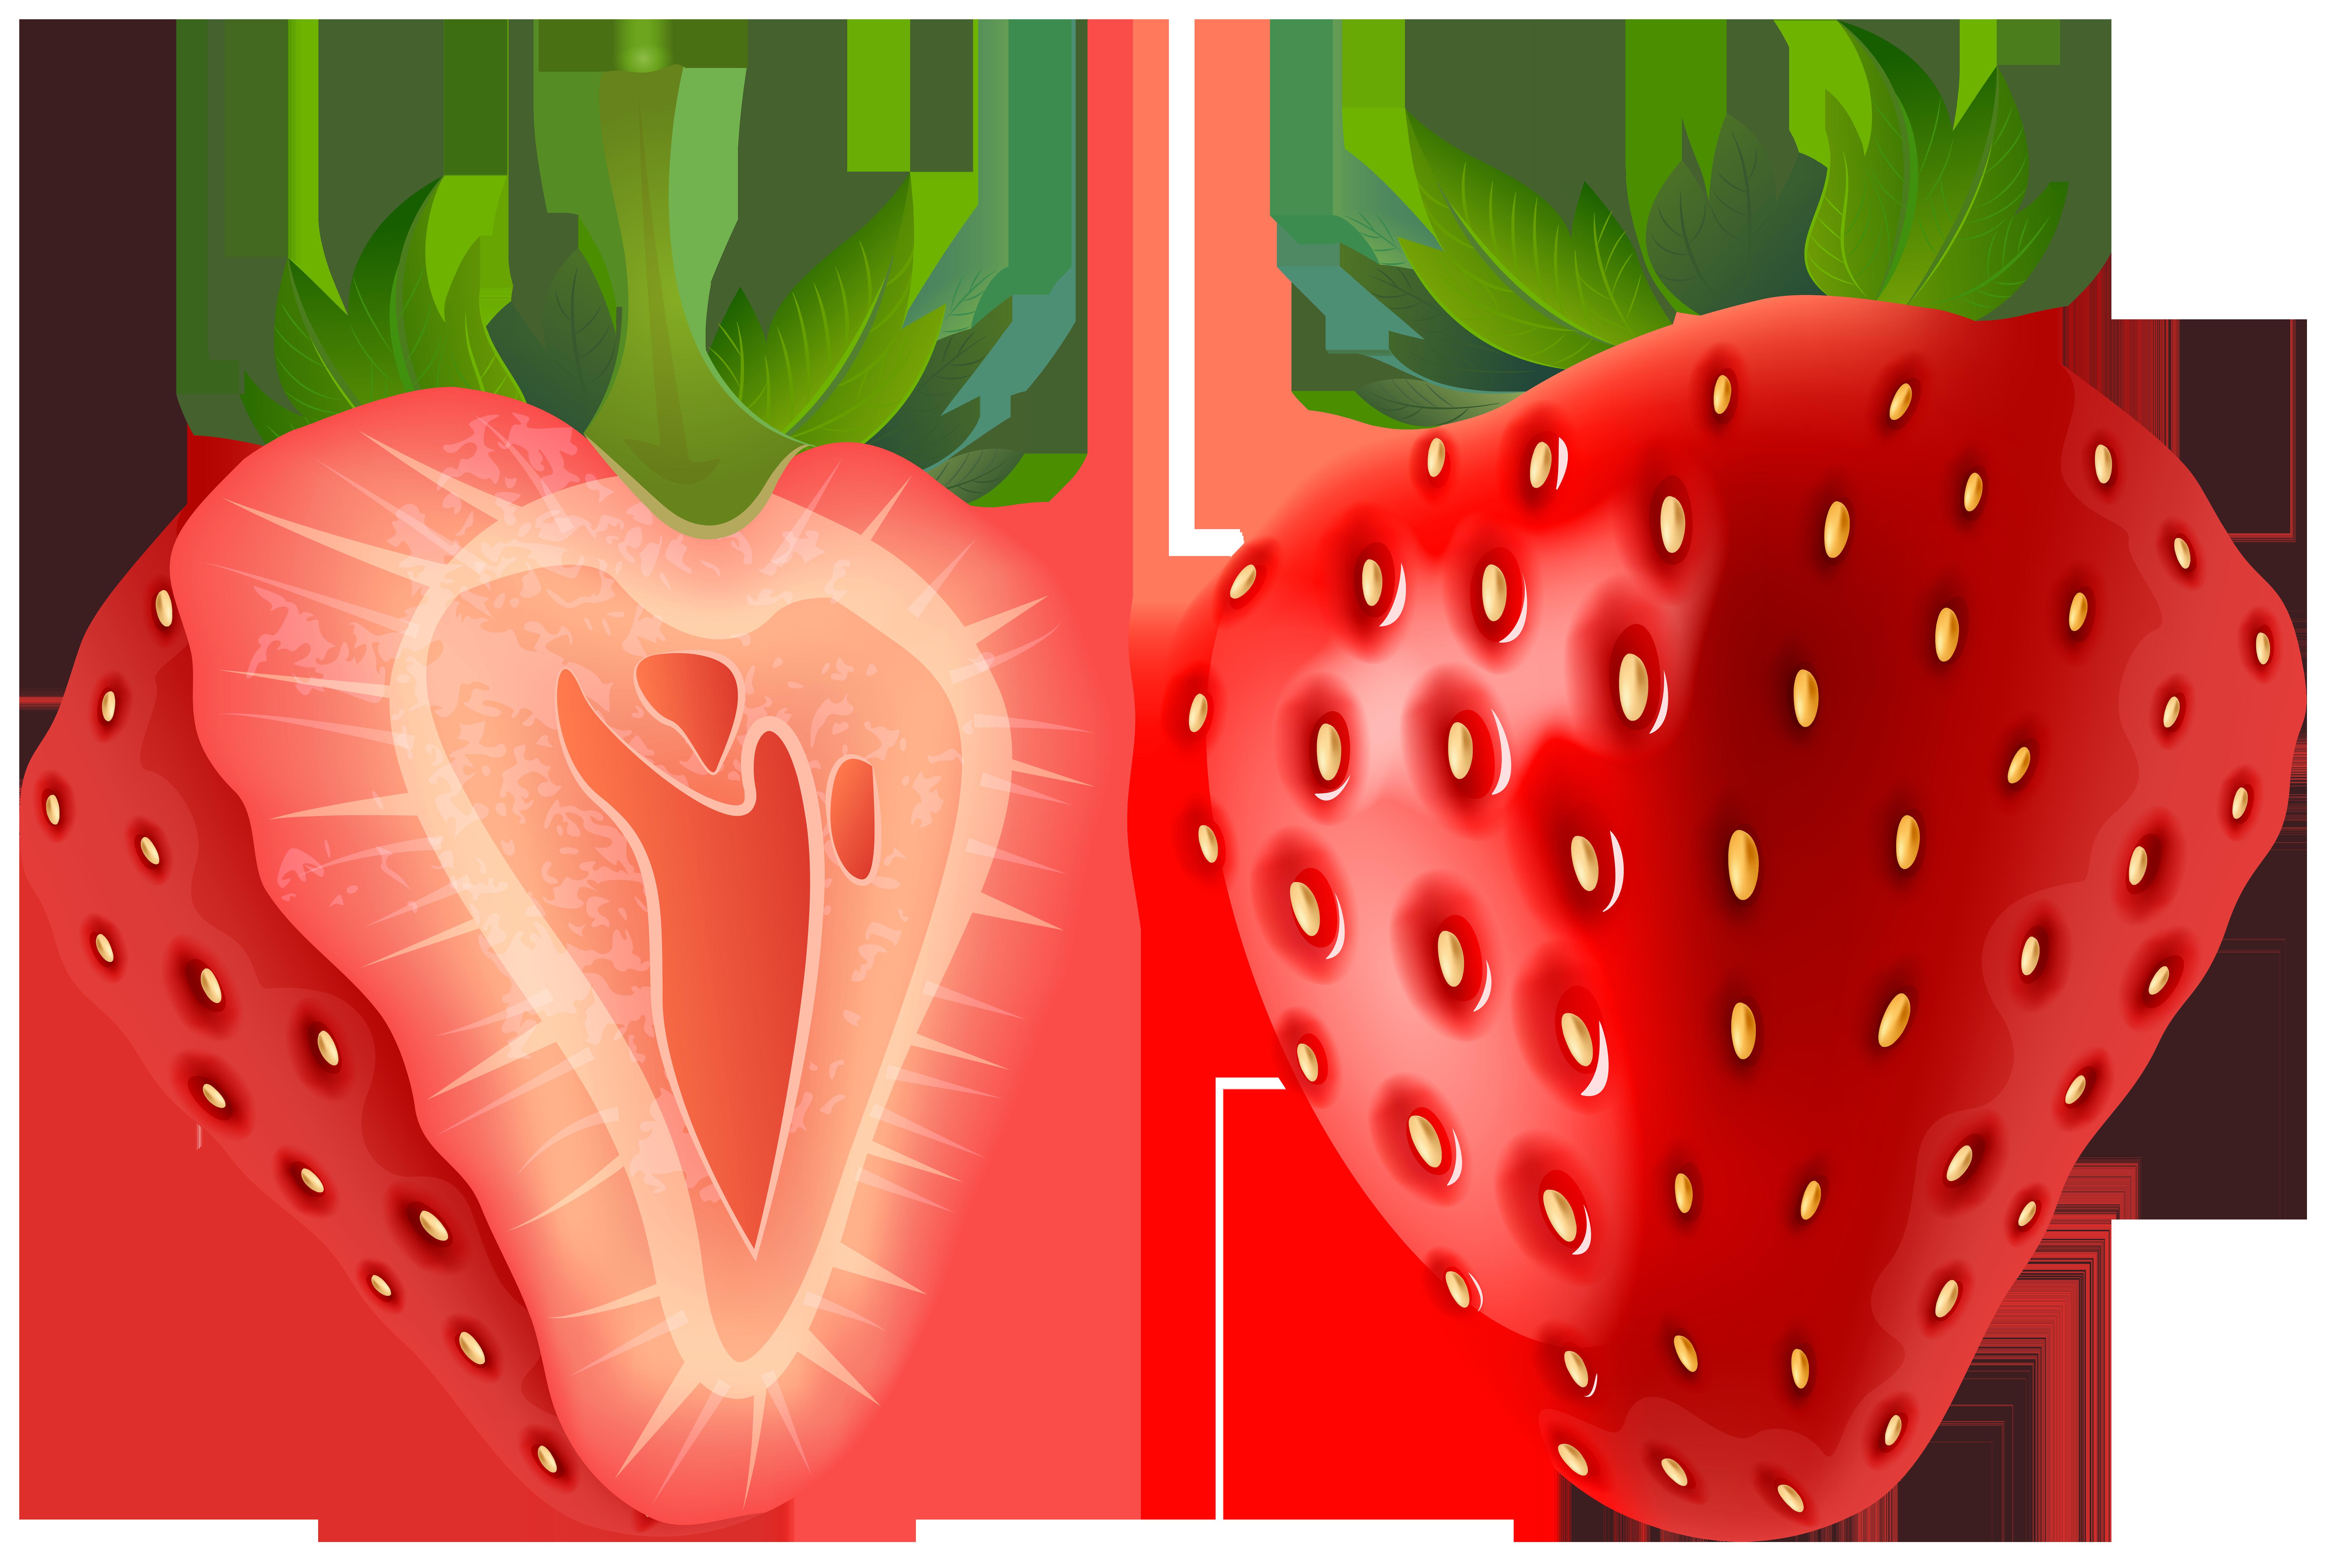 8000x5372 Strawberry Transparent Png Clip Art Imageu200b Gallery Yopriceville